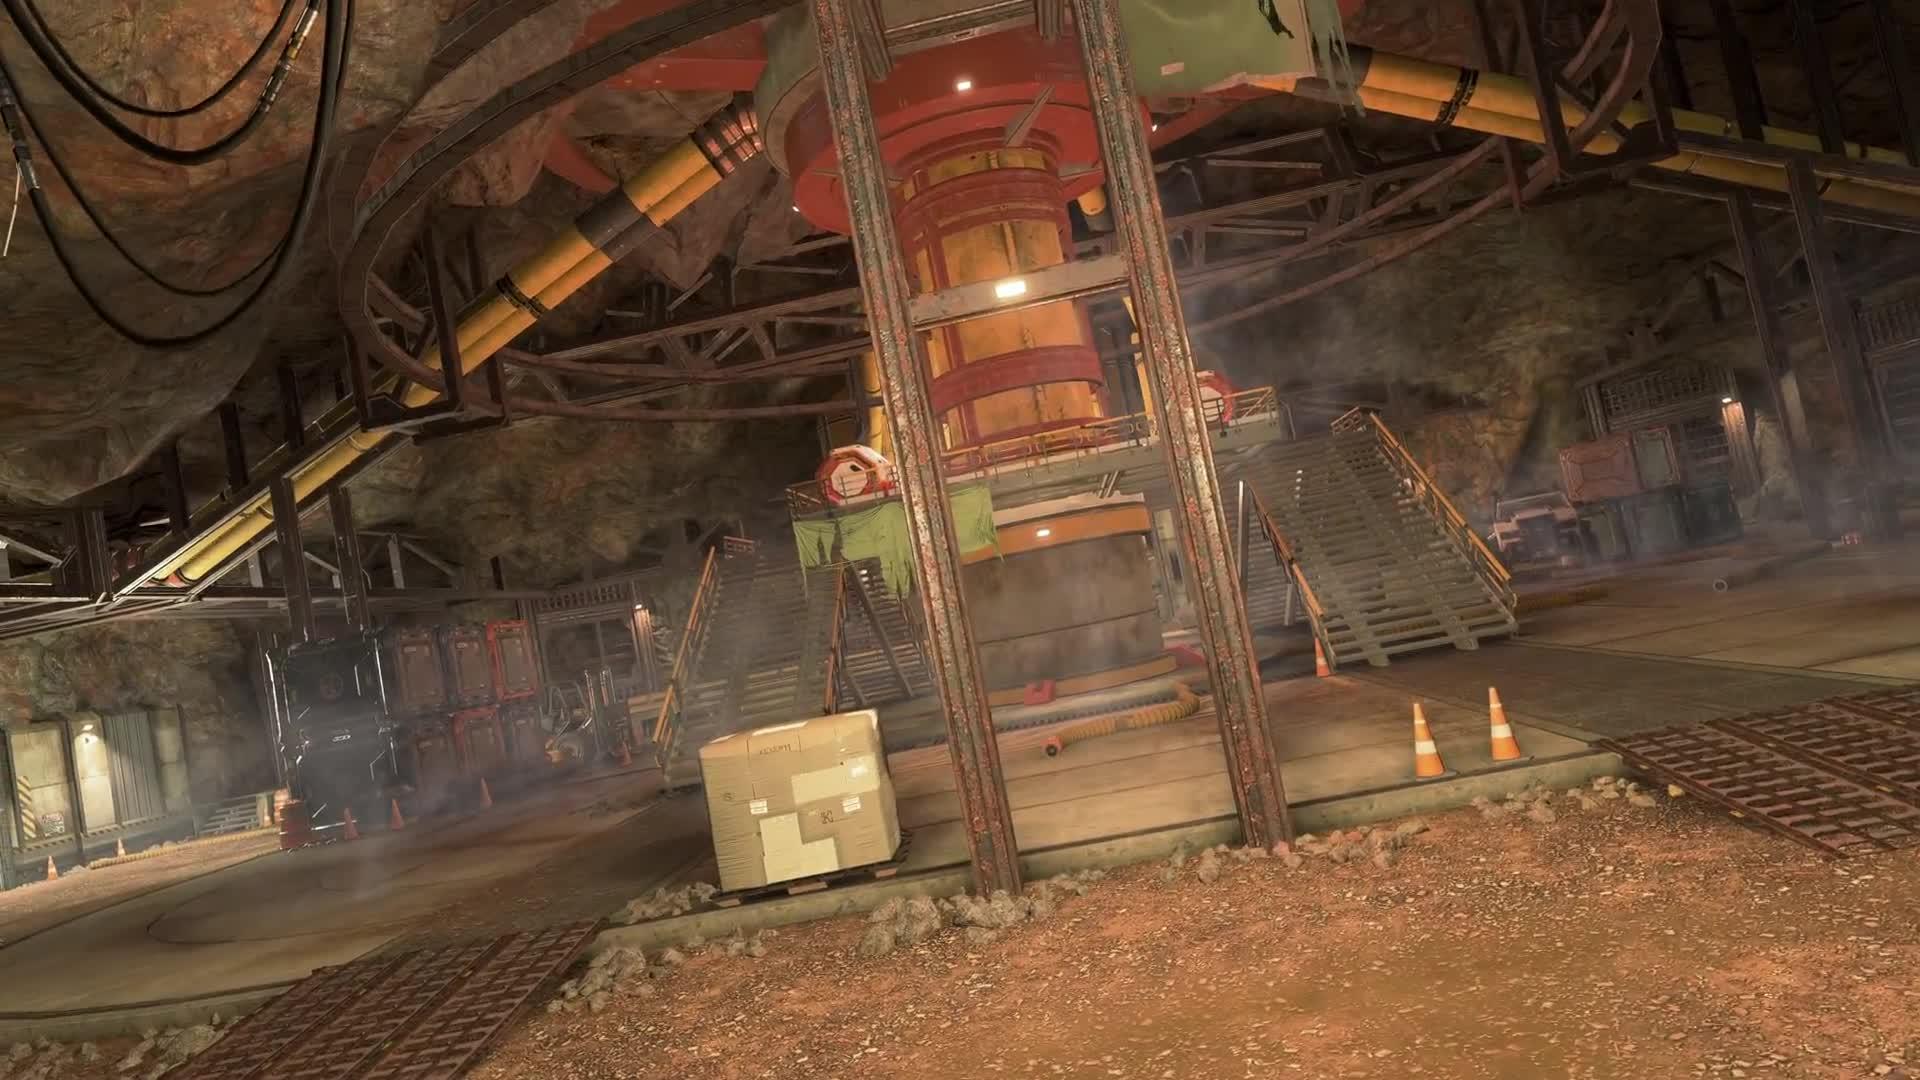 Apex Legends Season 3 - Meltdown Gameplay Trailer [HD] screen capture